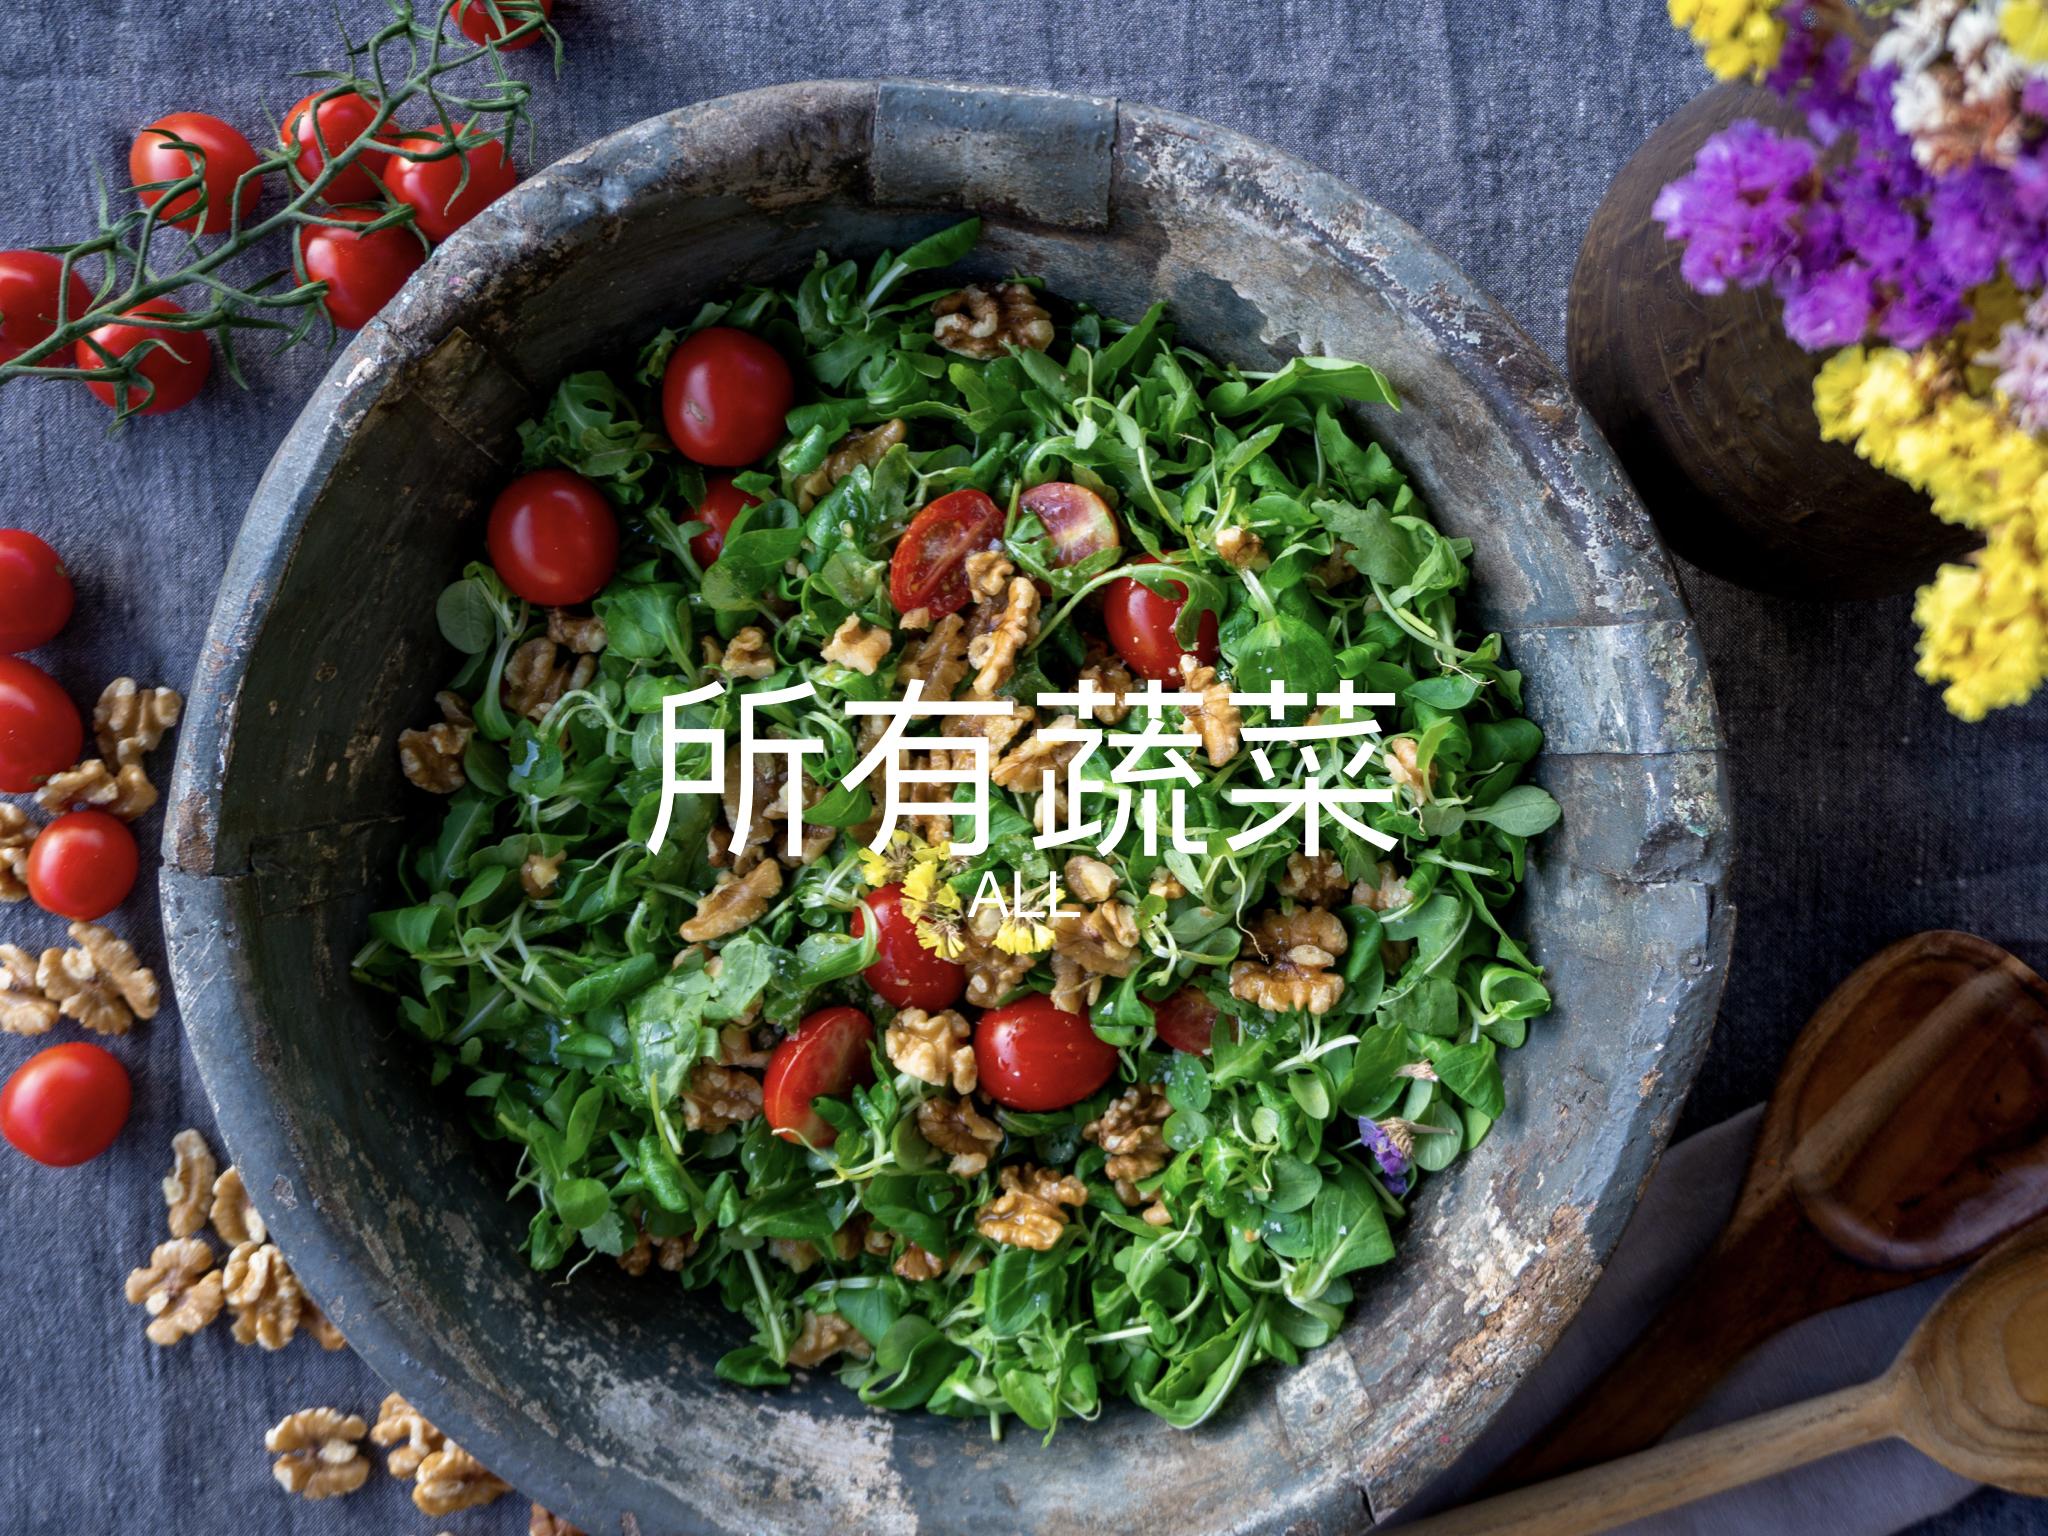 green up 蔬菜介紹 個別圖片.004.jpeg